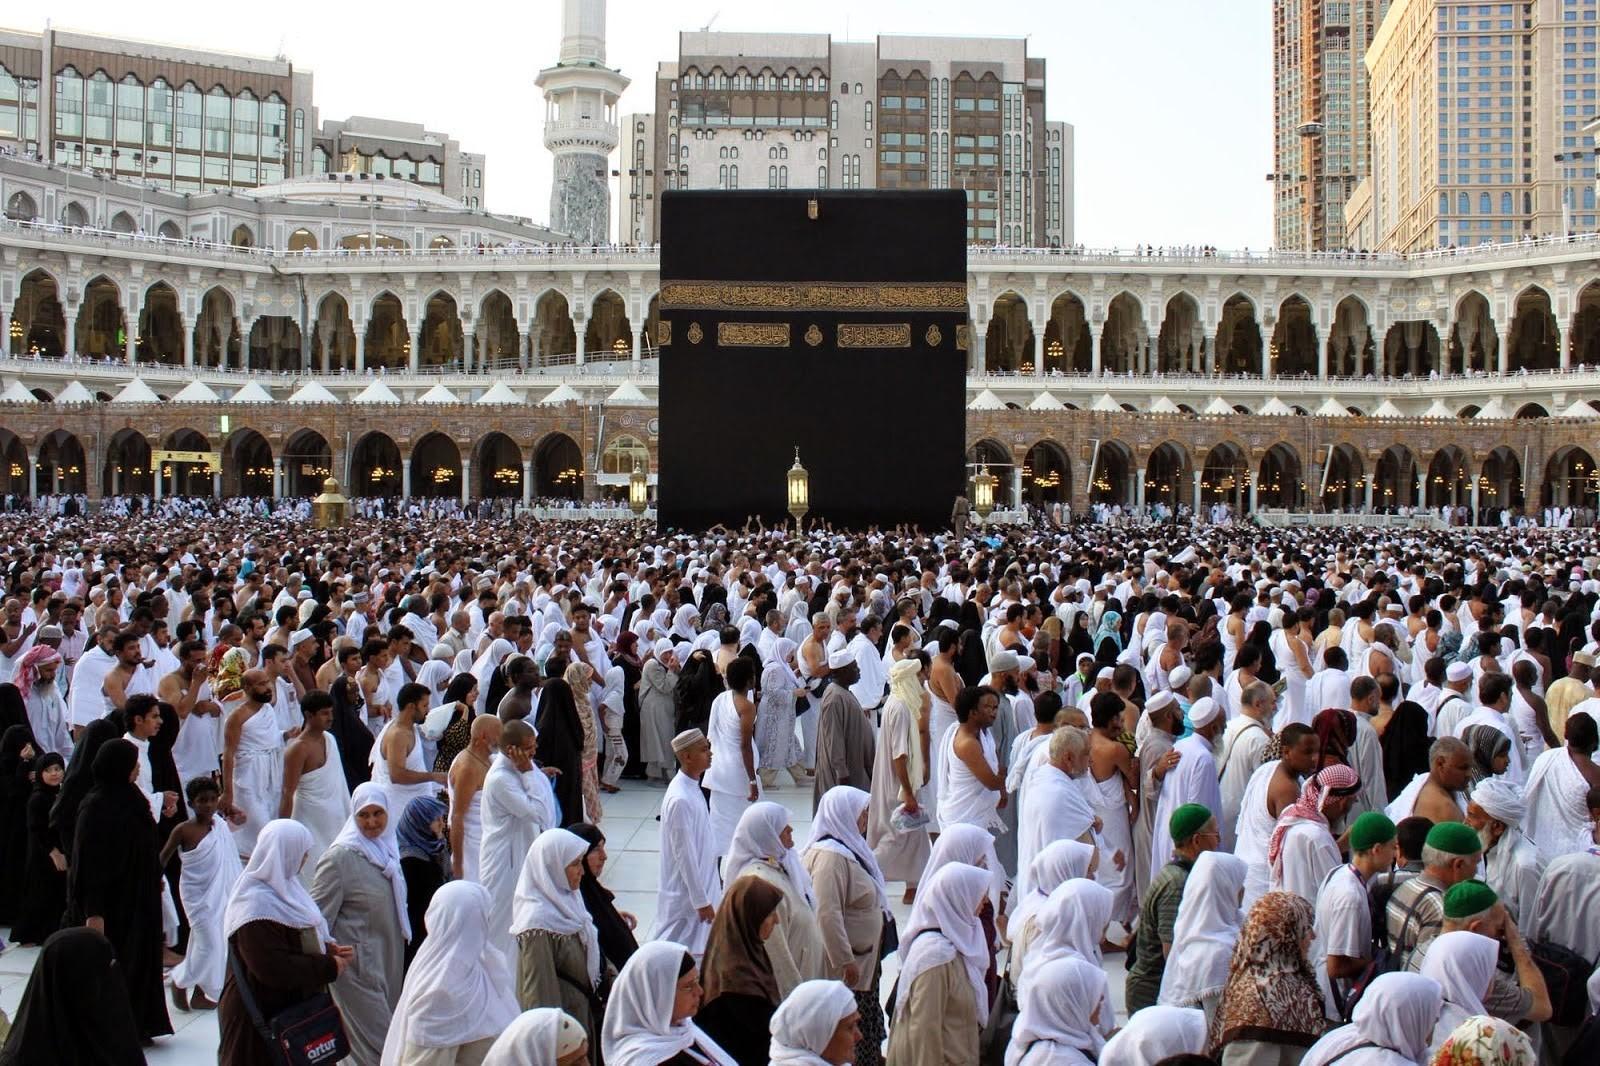 Cara Naik Haji Secara Backpacker Ke Saudi Arabia Menggunakan Visa Ziarah Atau Visa Haji Negara Luar.